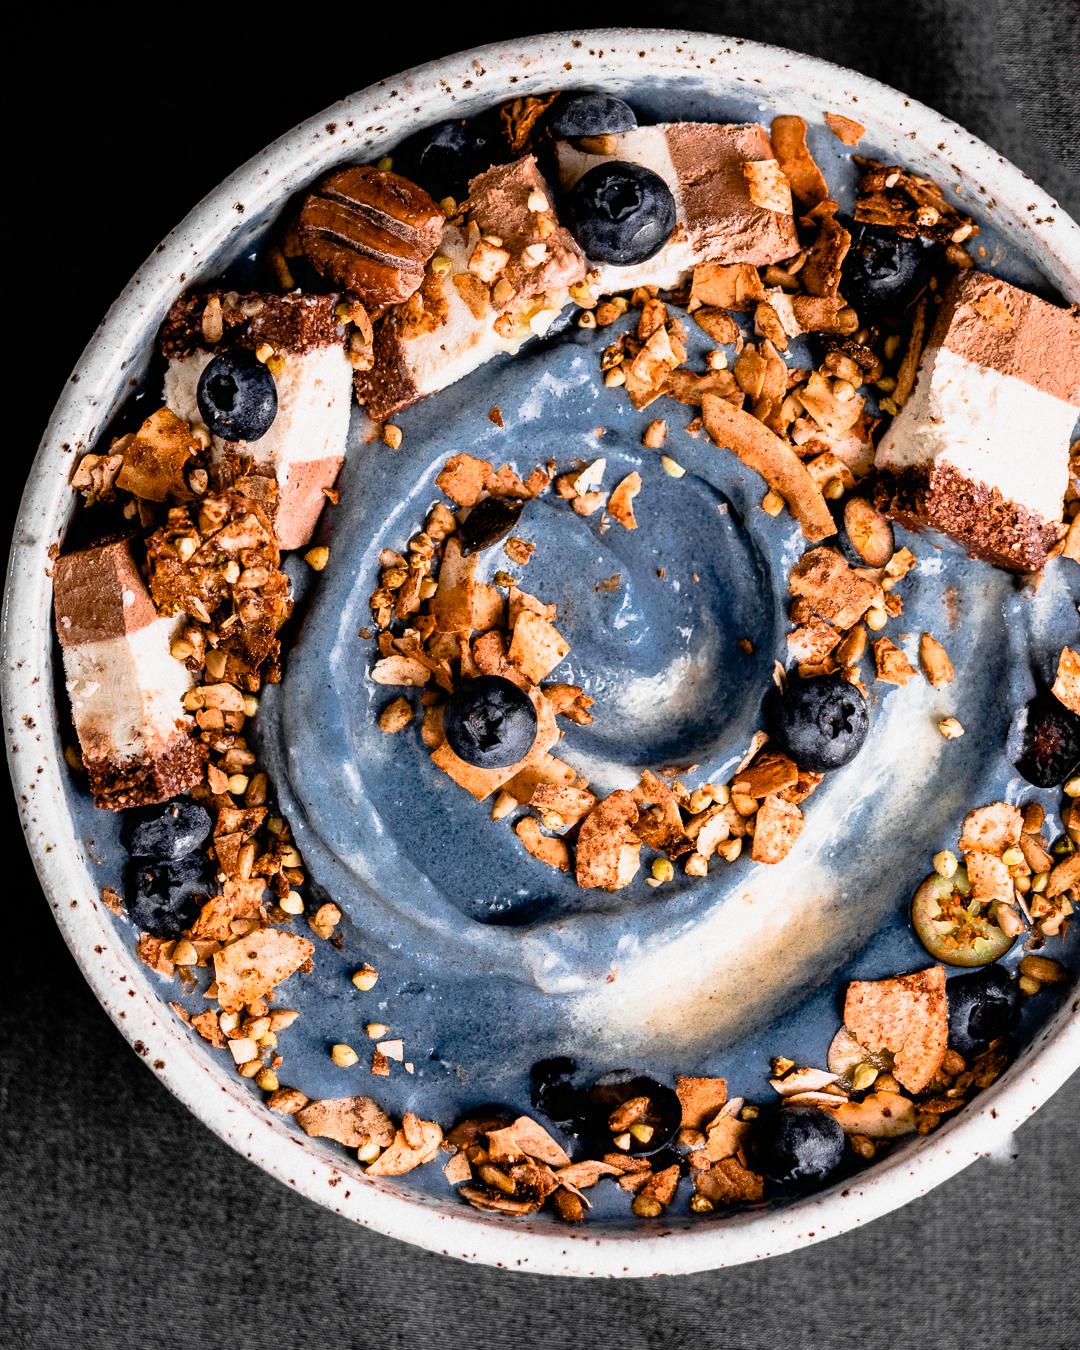 Banana_and_Coconut_Blue_Smoothy_Bowl__portrait_by_Jordan_Pie_Nutritionist_Photographer-1.jpg